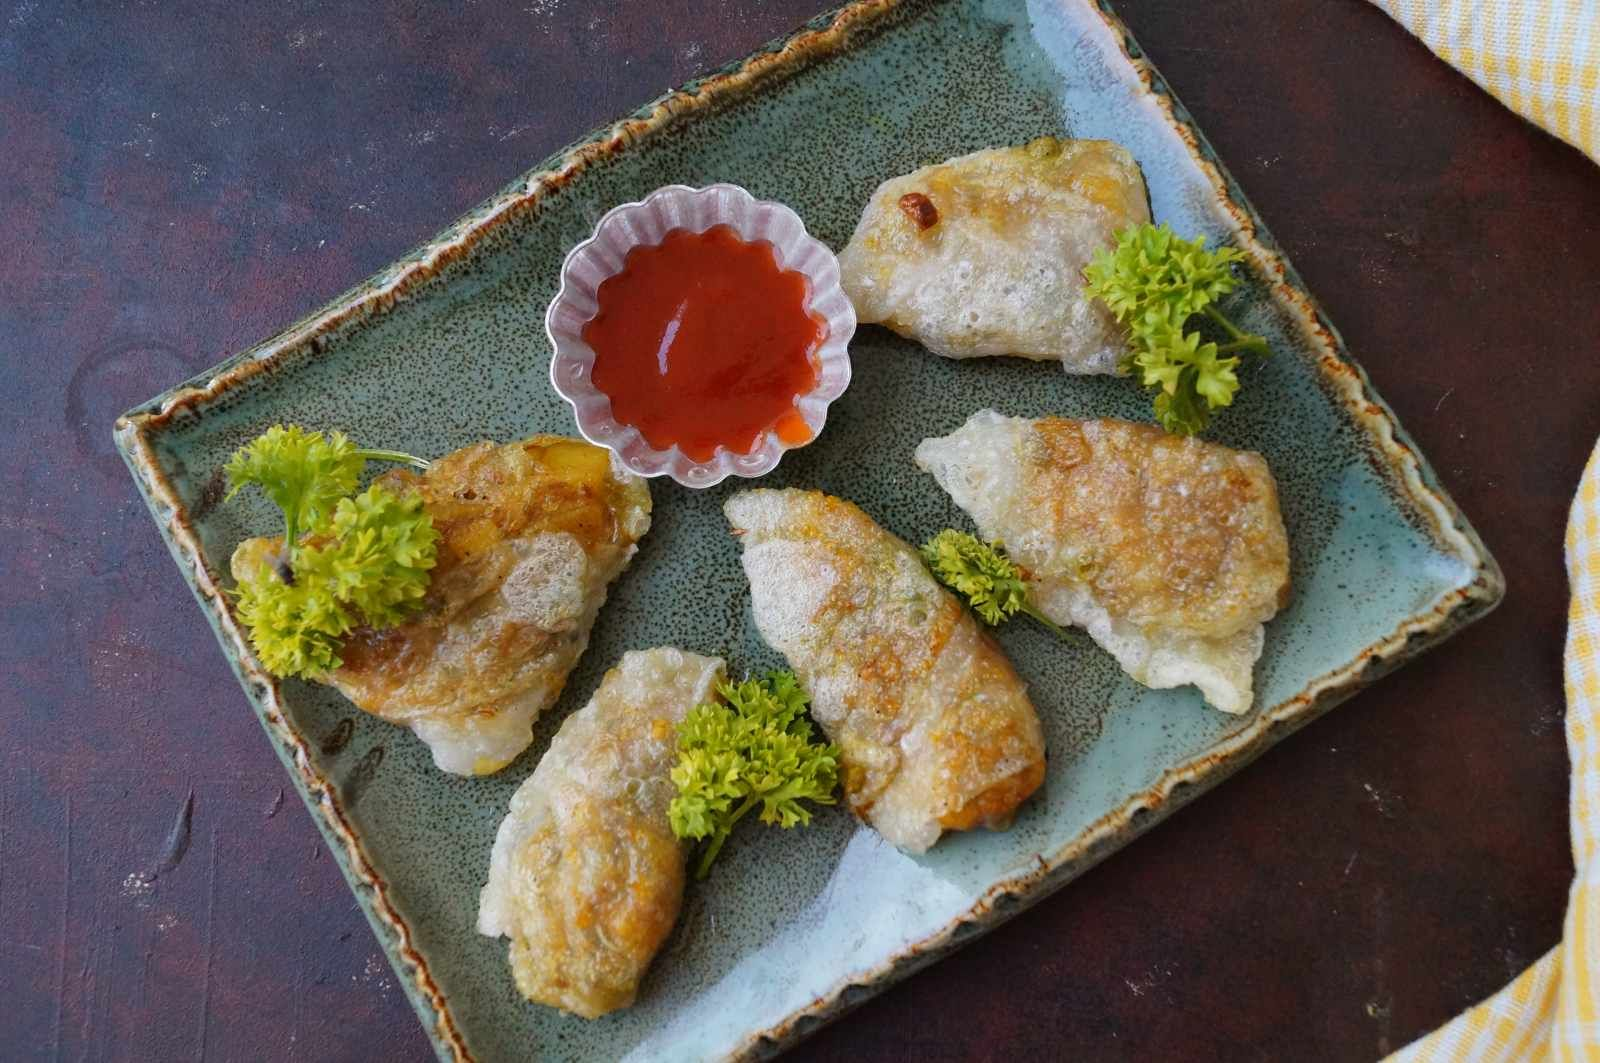 Gluten Free Samosa Recipe (With images) Samosa recipe